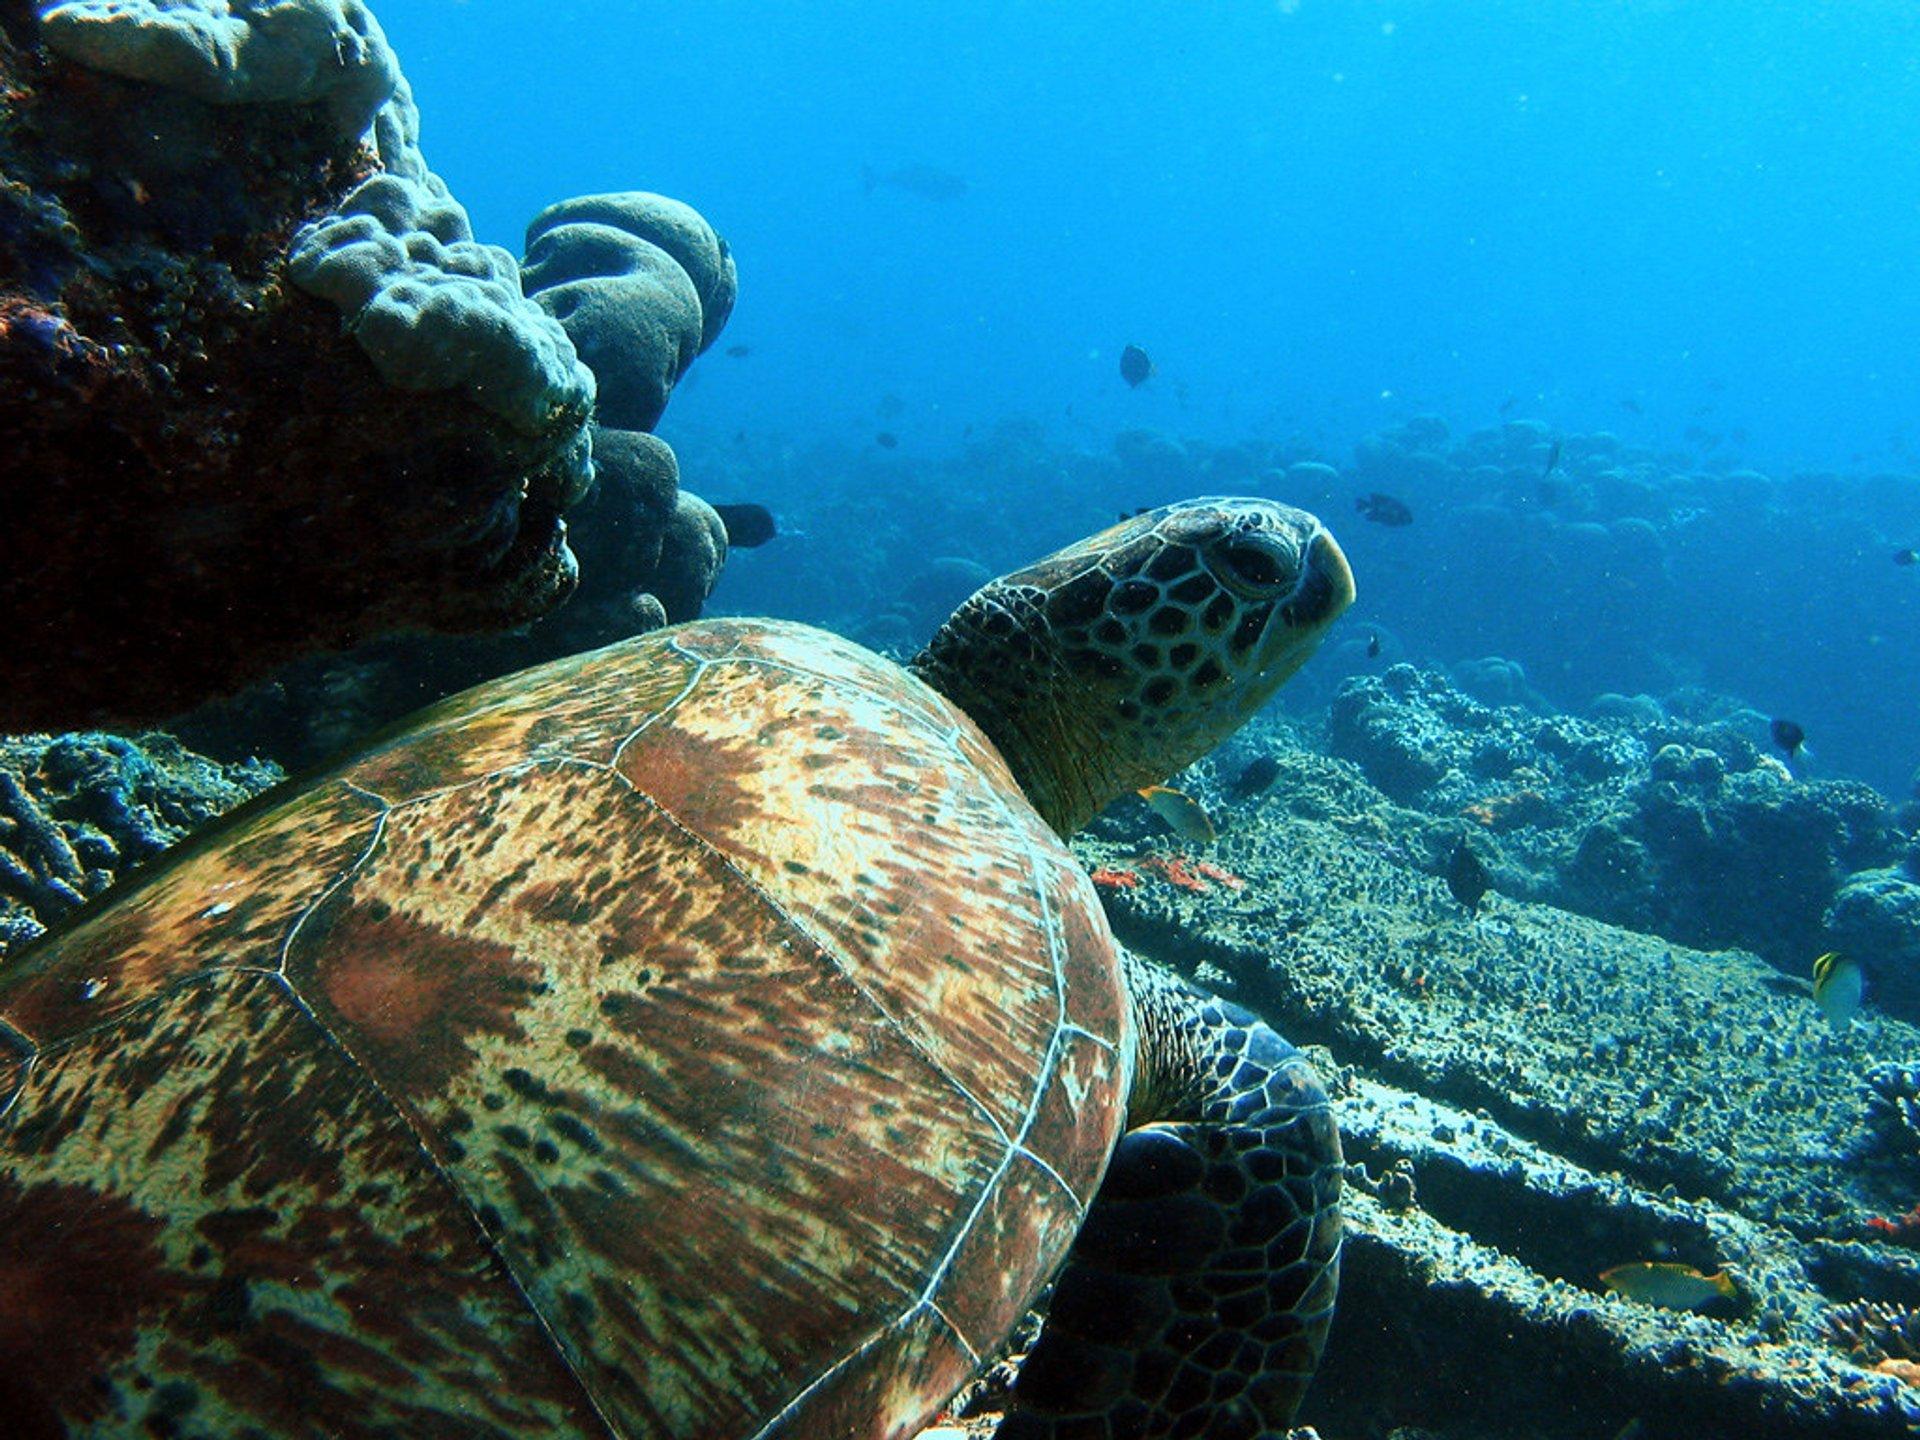 Scuba Dive in Singapore 2020 - Best Time